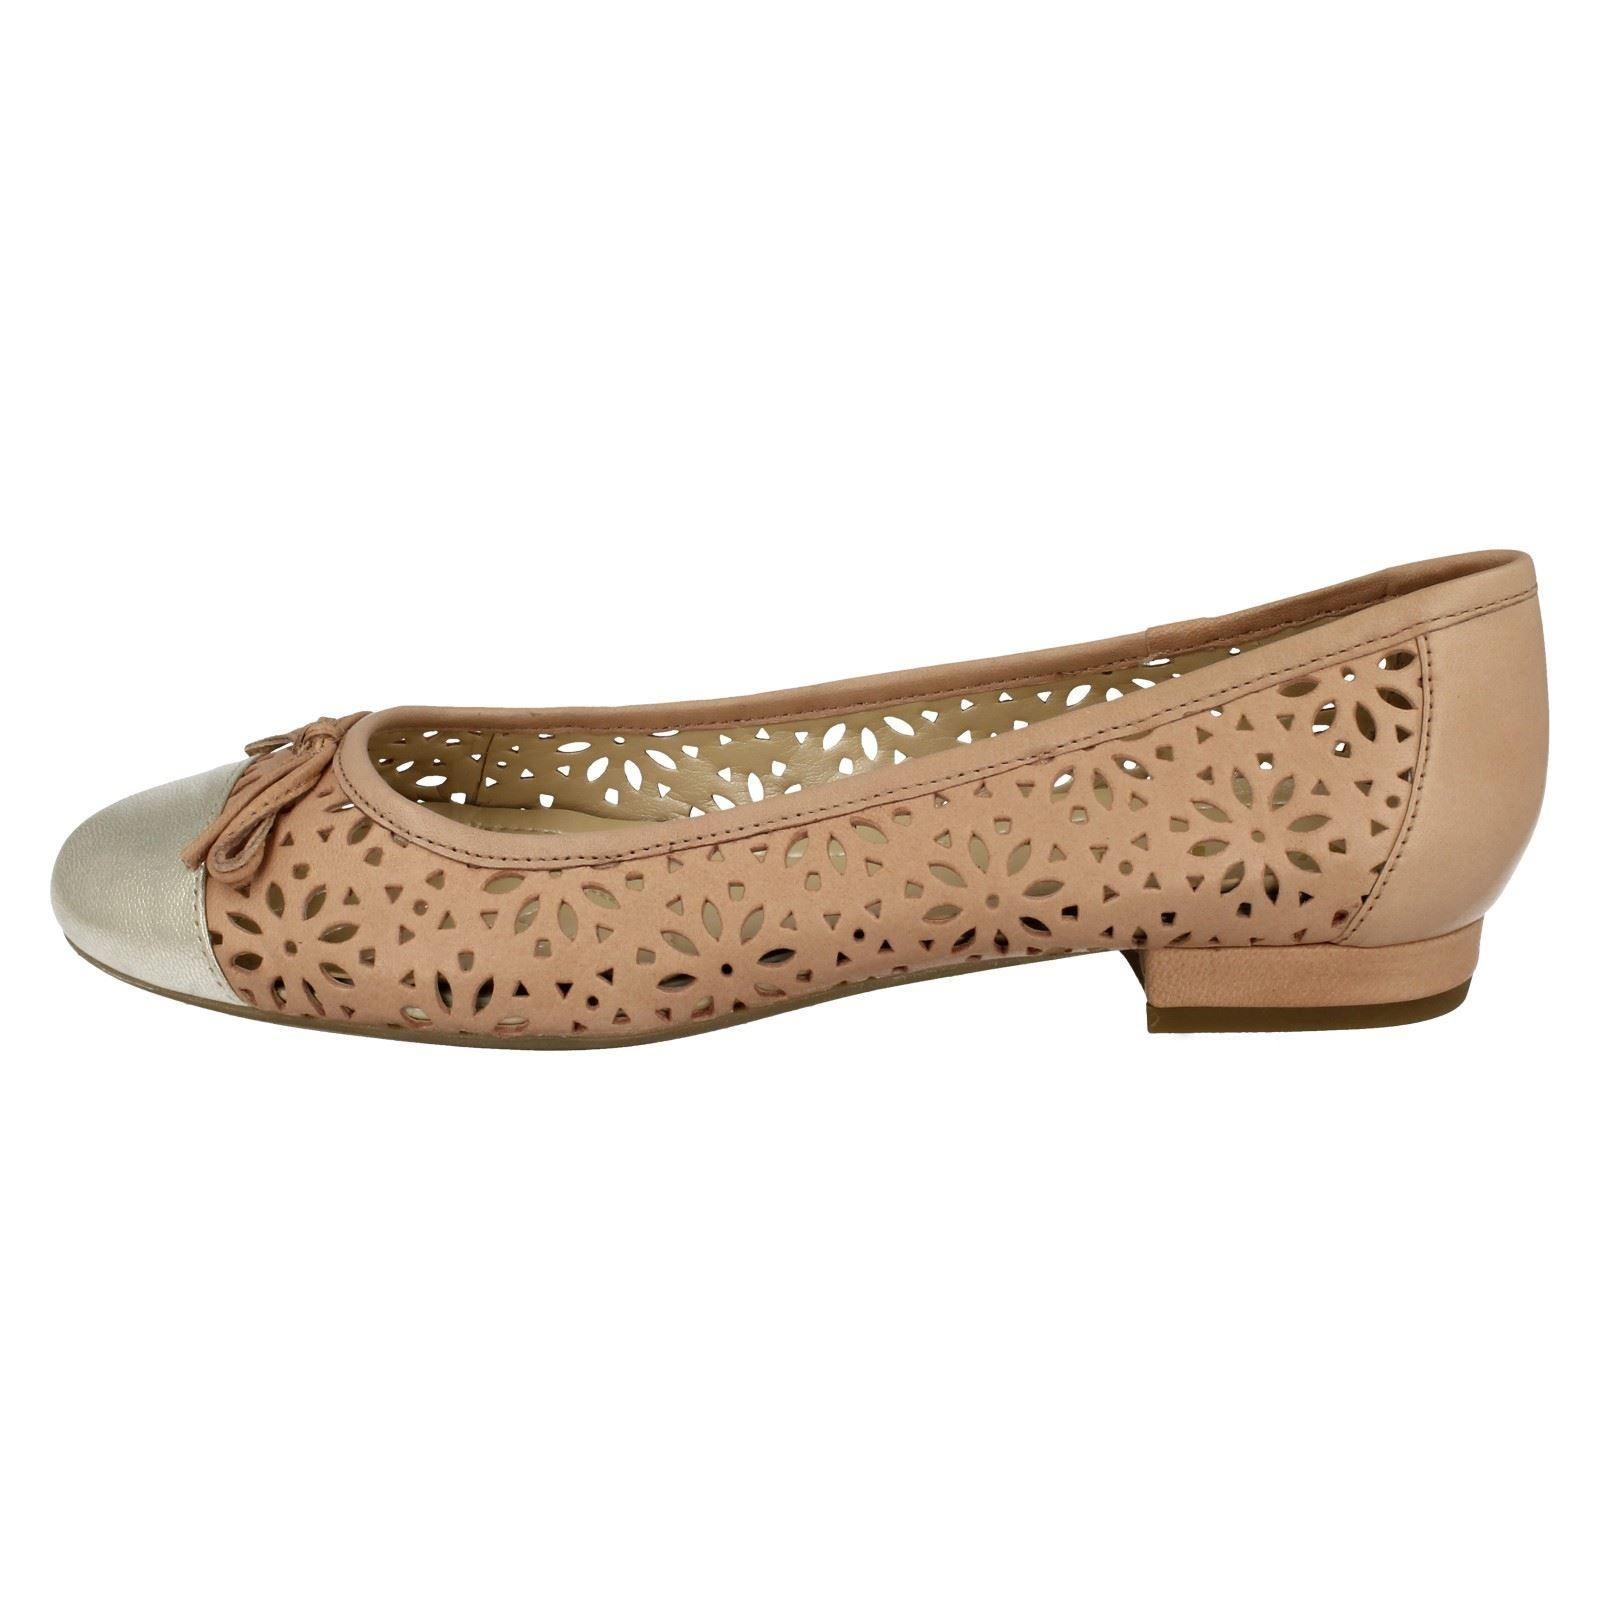 oro plateau rosa Slip con Dal rosa On Ladies pelle Van Tahoe e Elegante in ballerina 78t7Ox